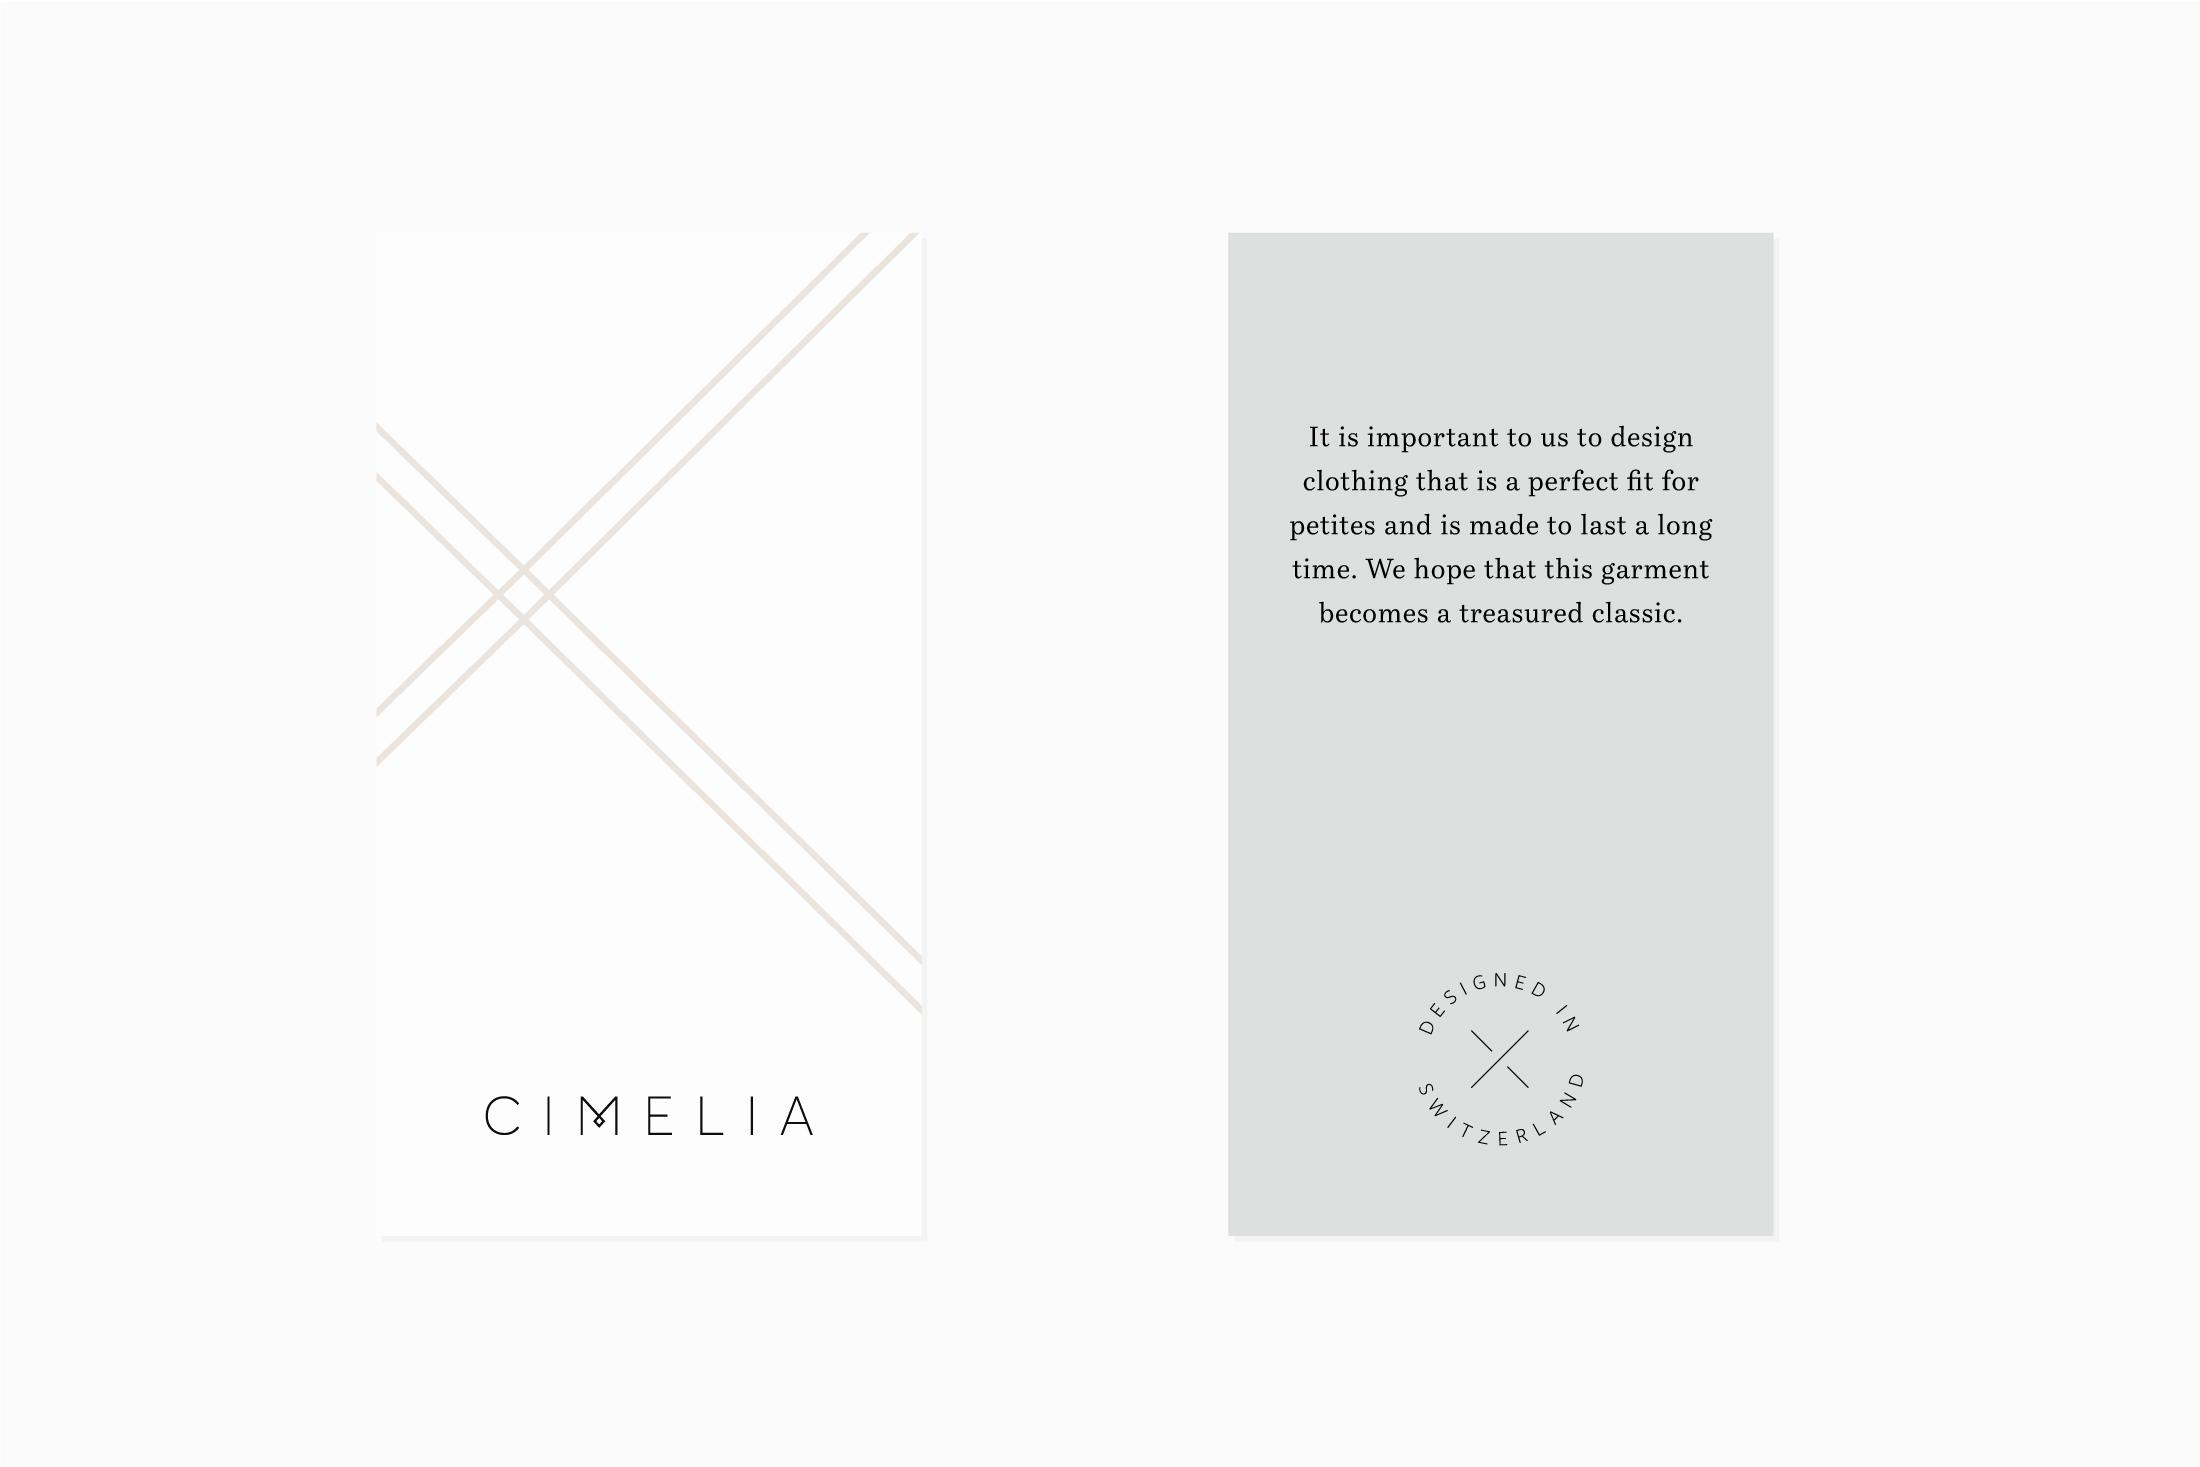 CIMELIA-labels.jpg